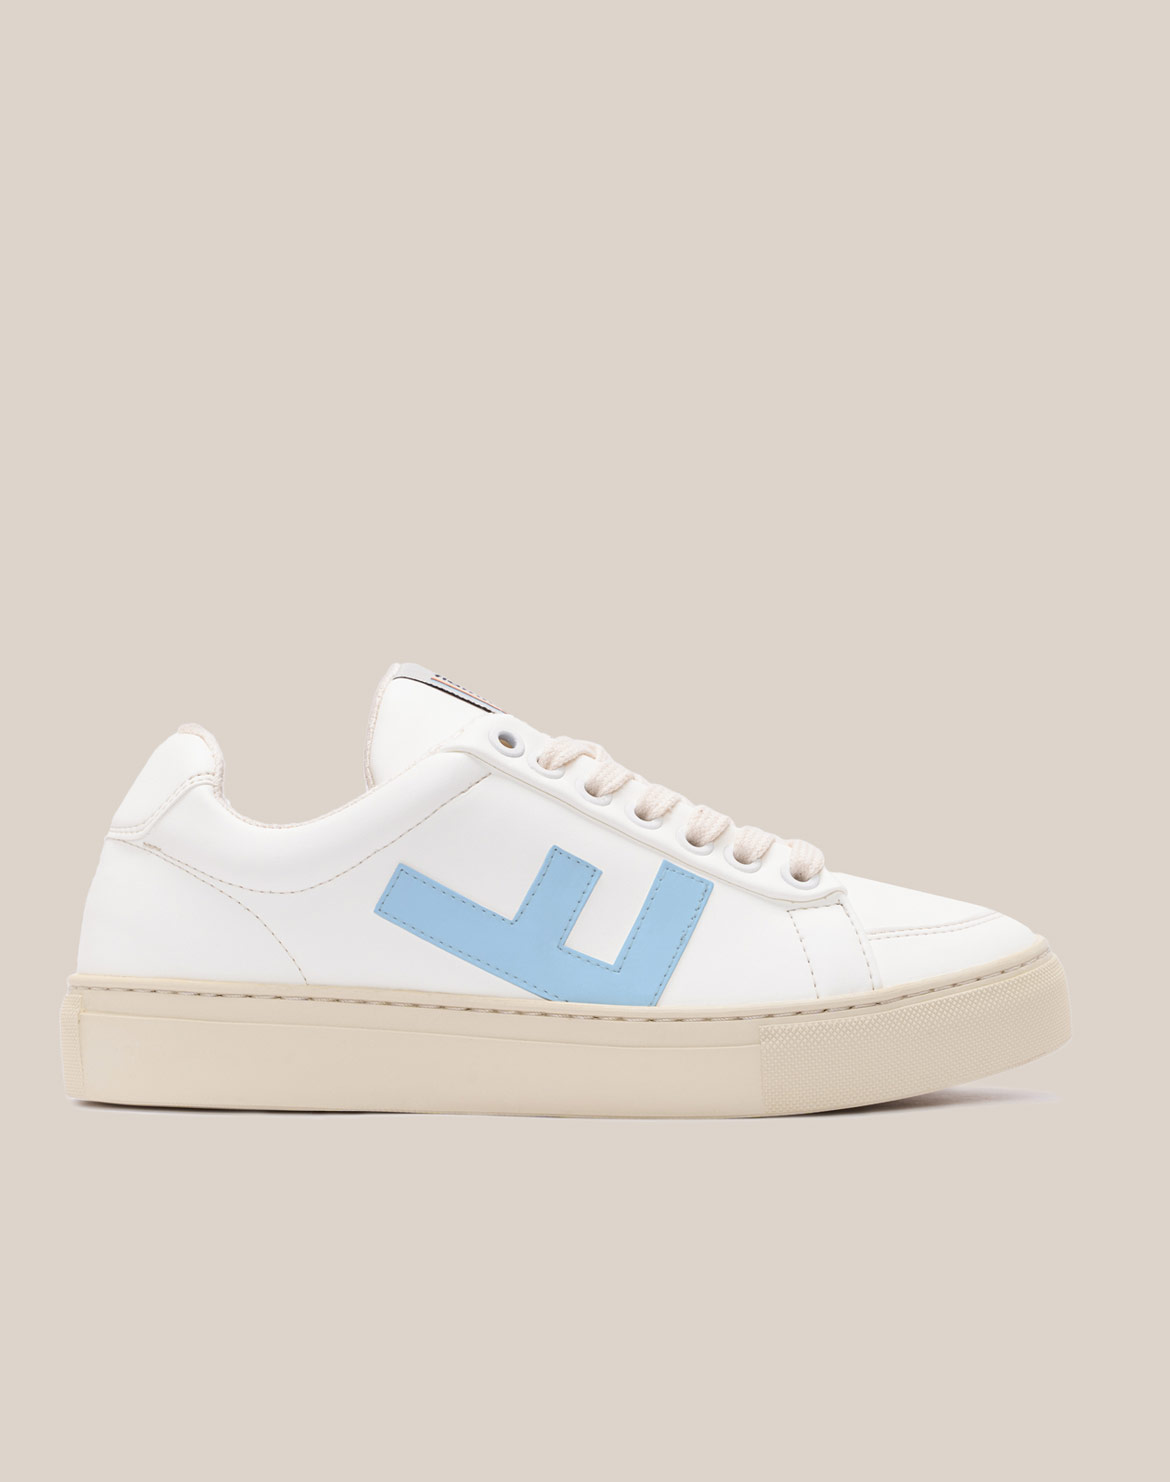 White/Blue/Grey